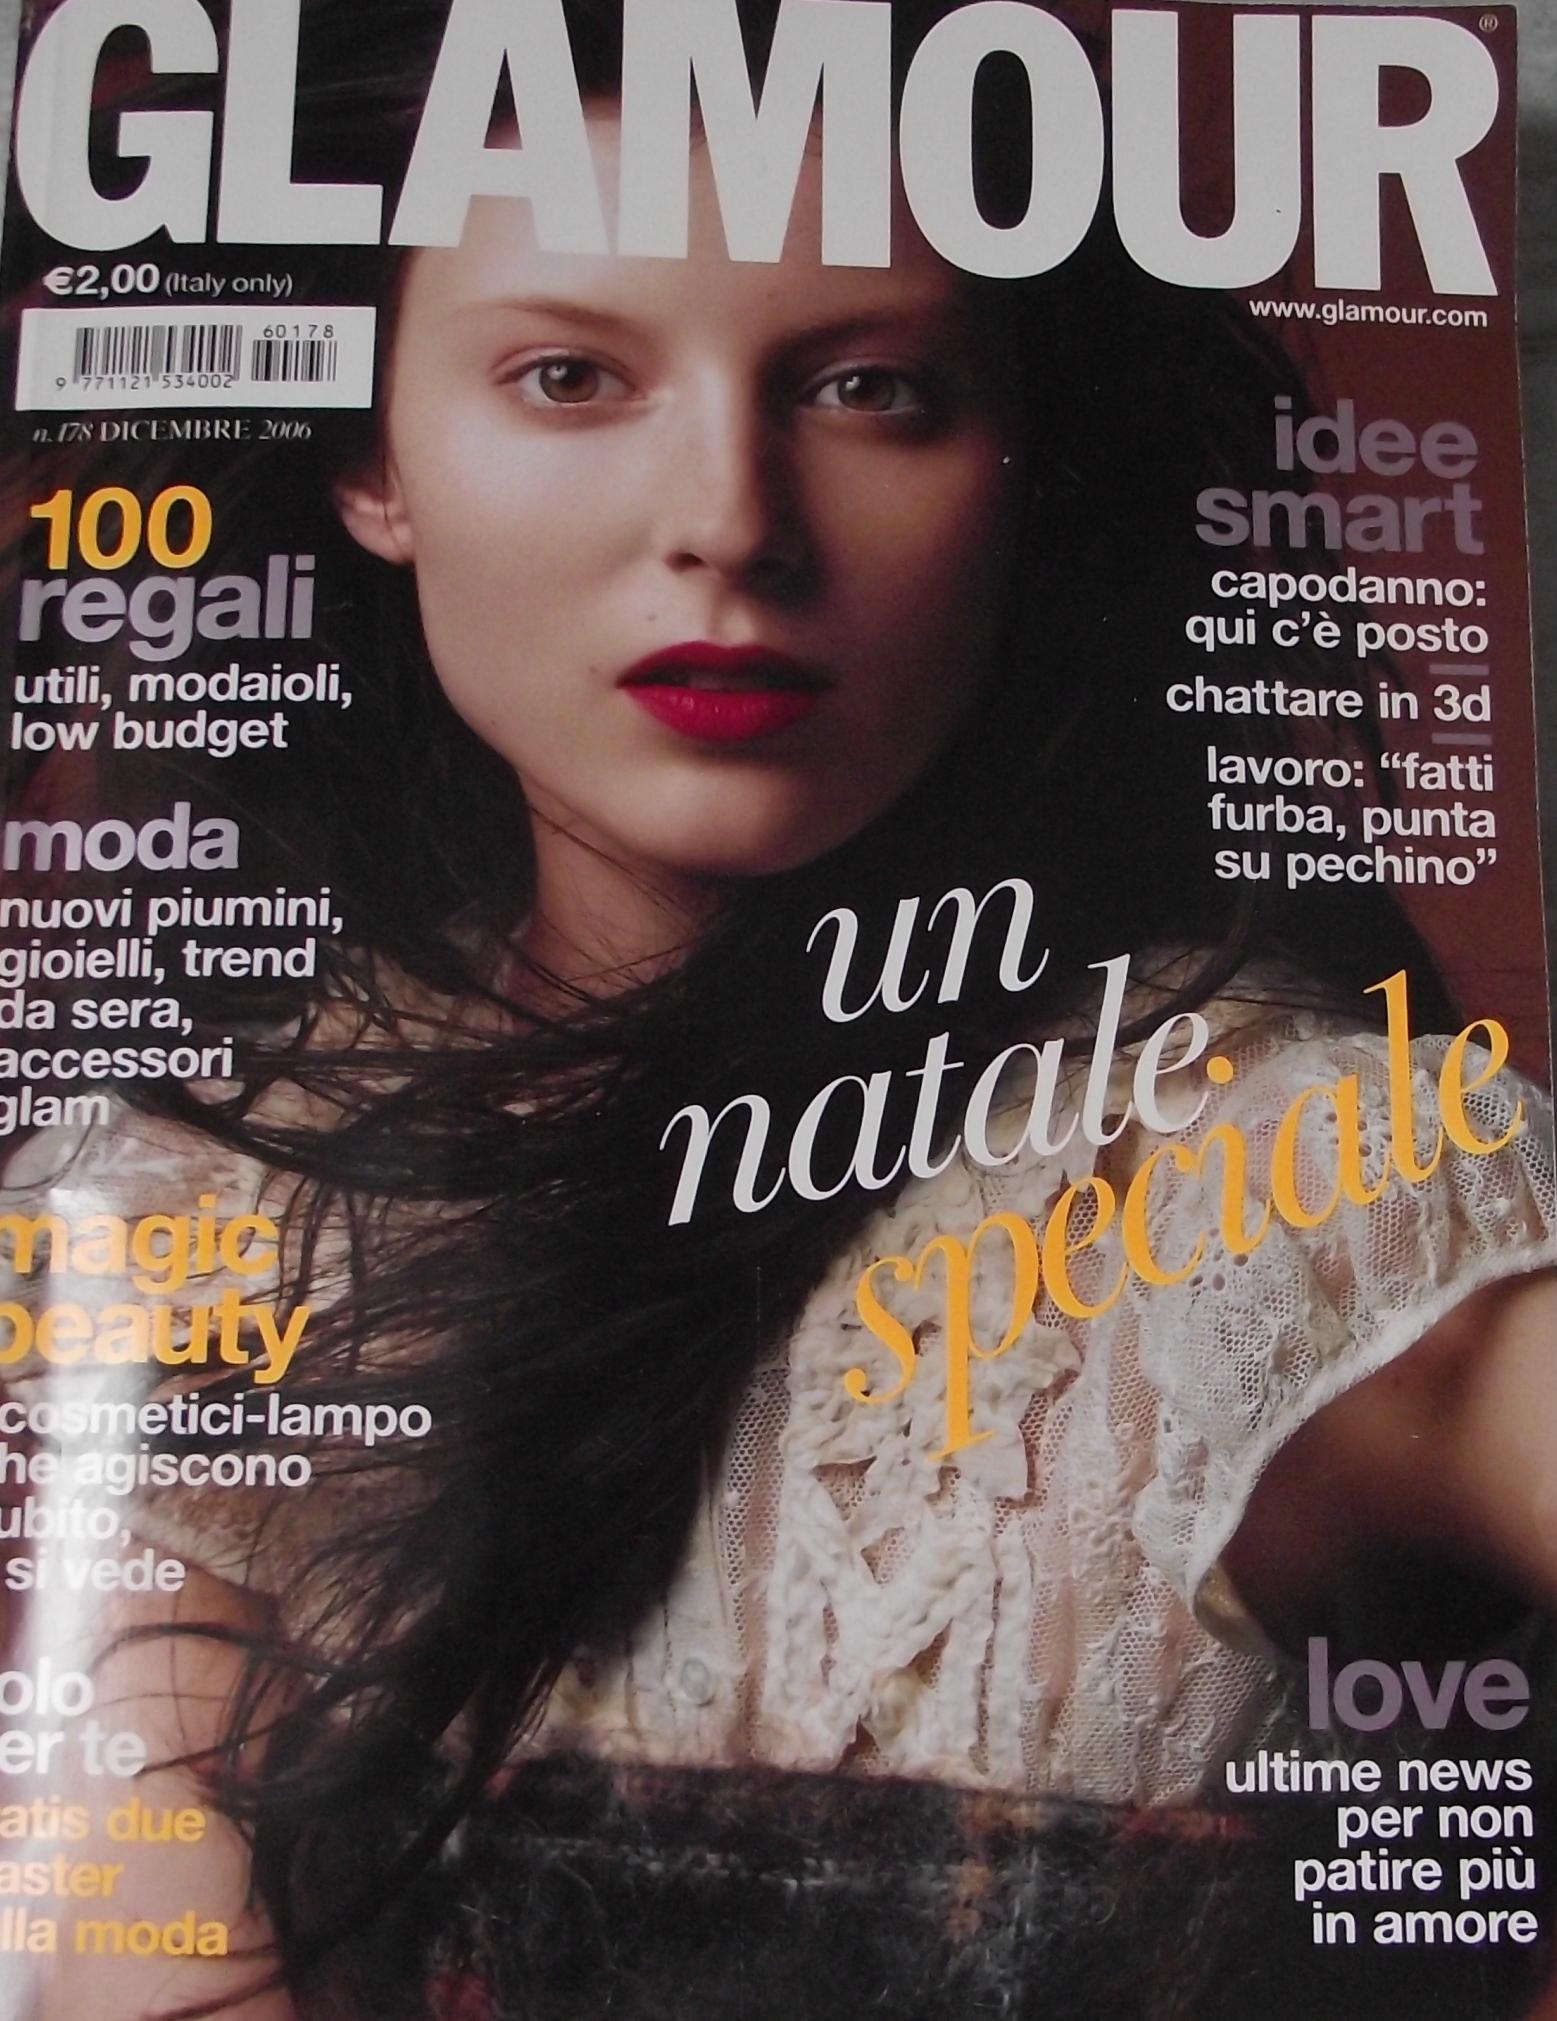 Glamour 2006